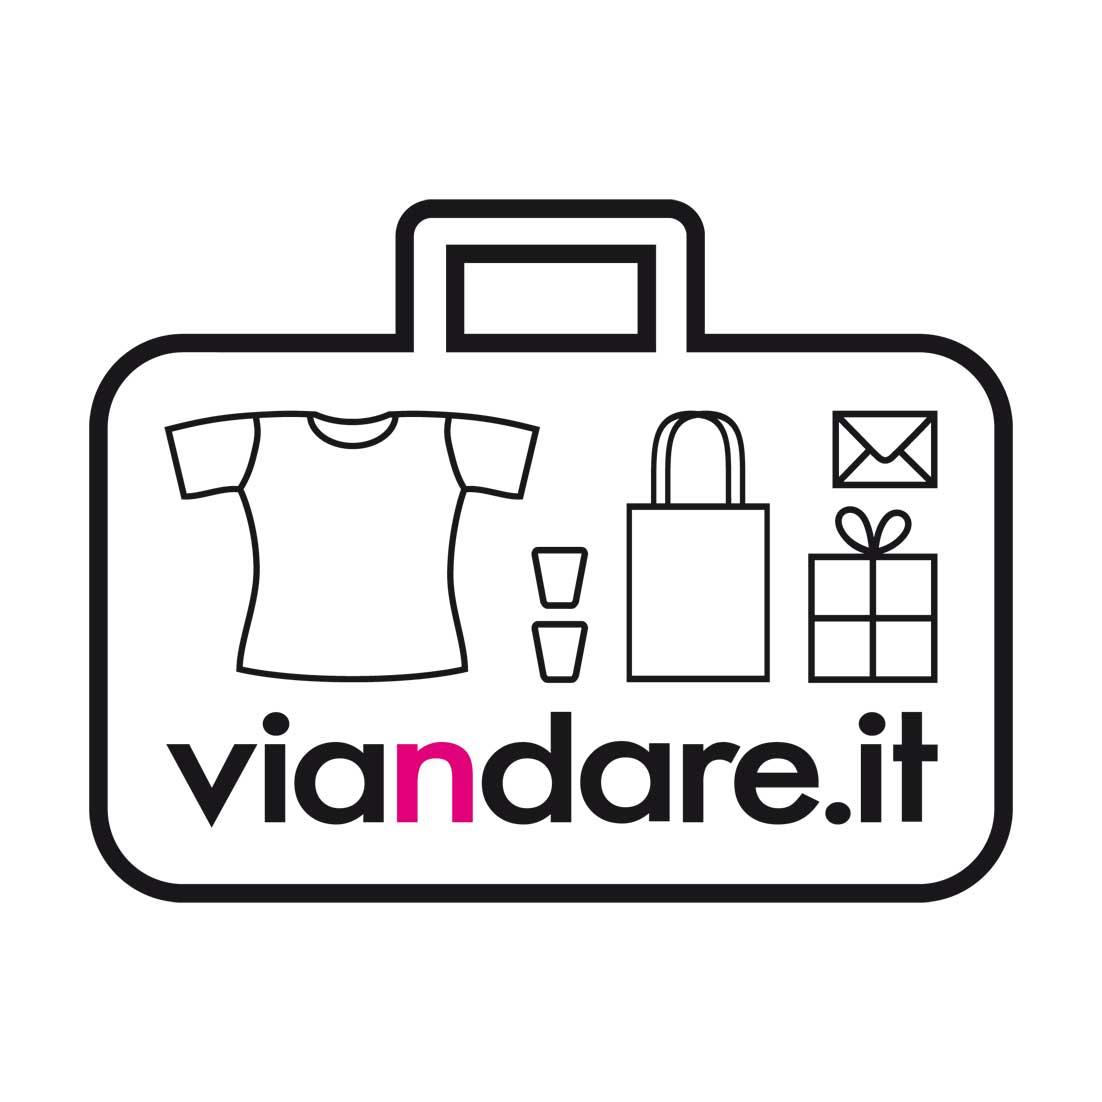 logo_viandare_grande.jpg